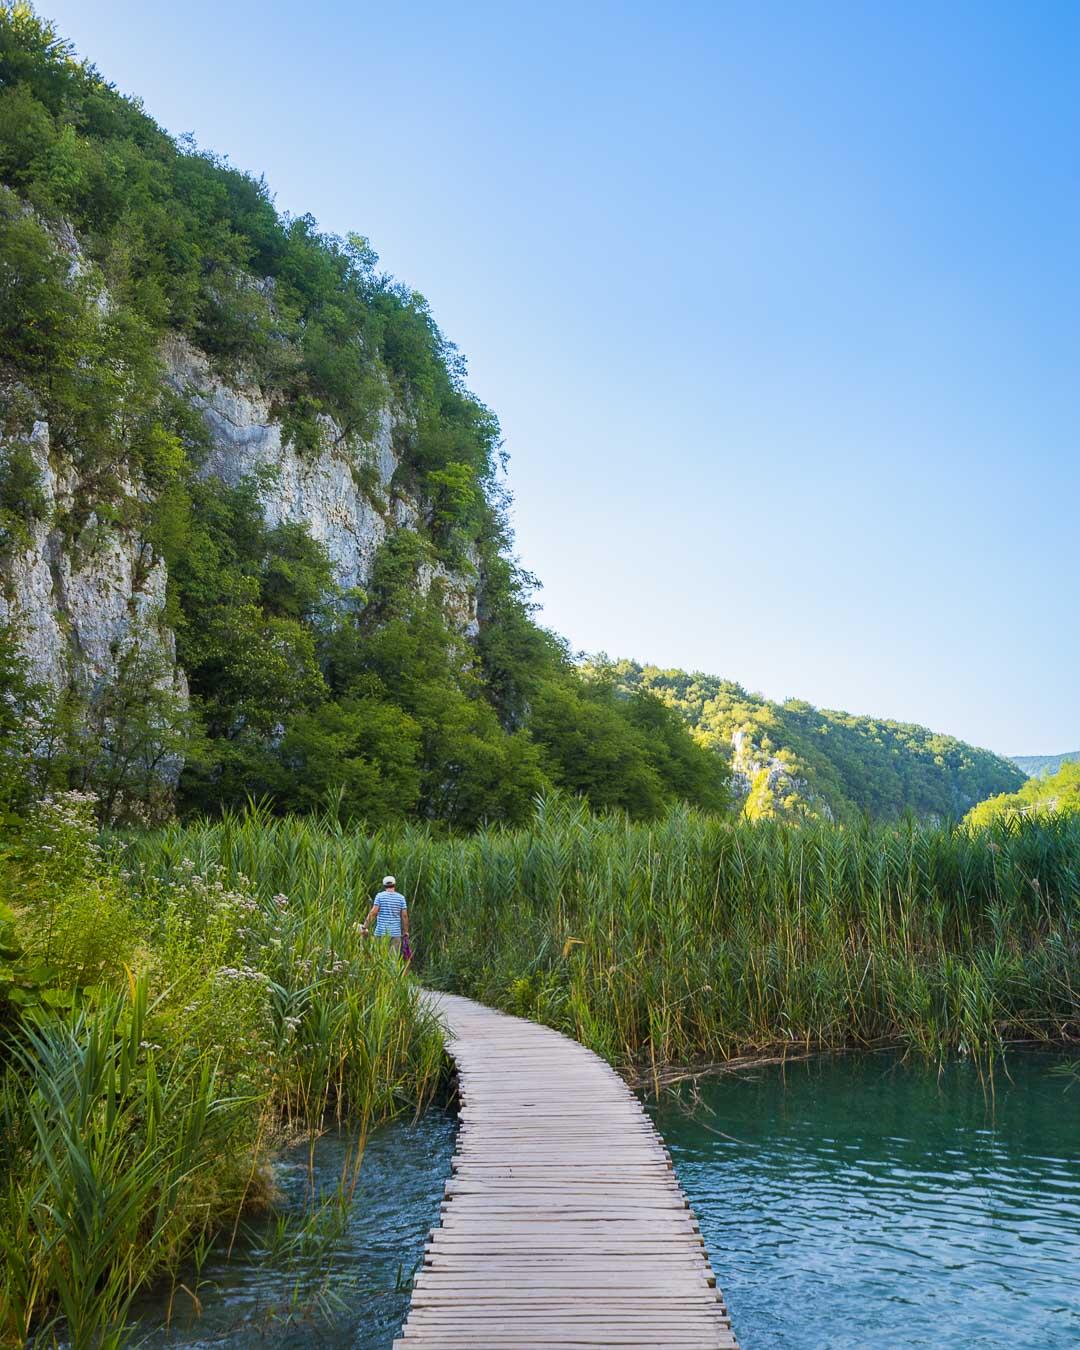 Plitvice Lakes National Park: Plitvice Lakes Photos To Fuel Your Inspiration